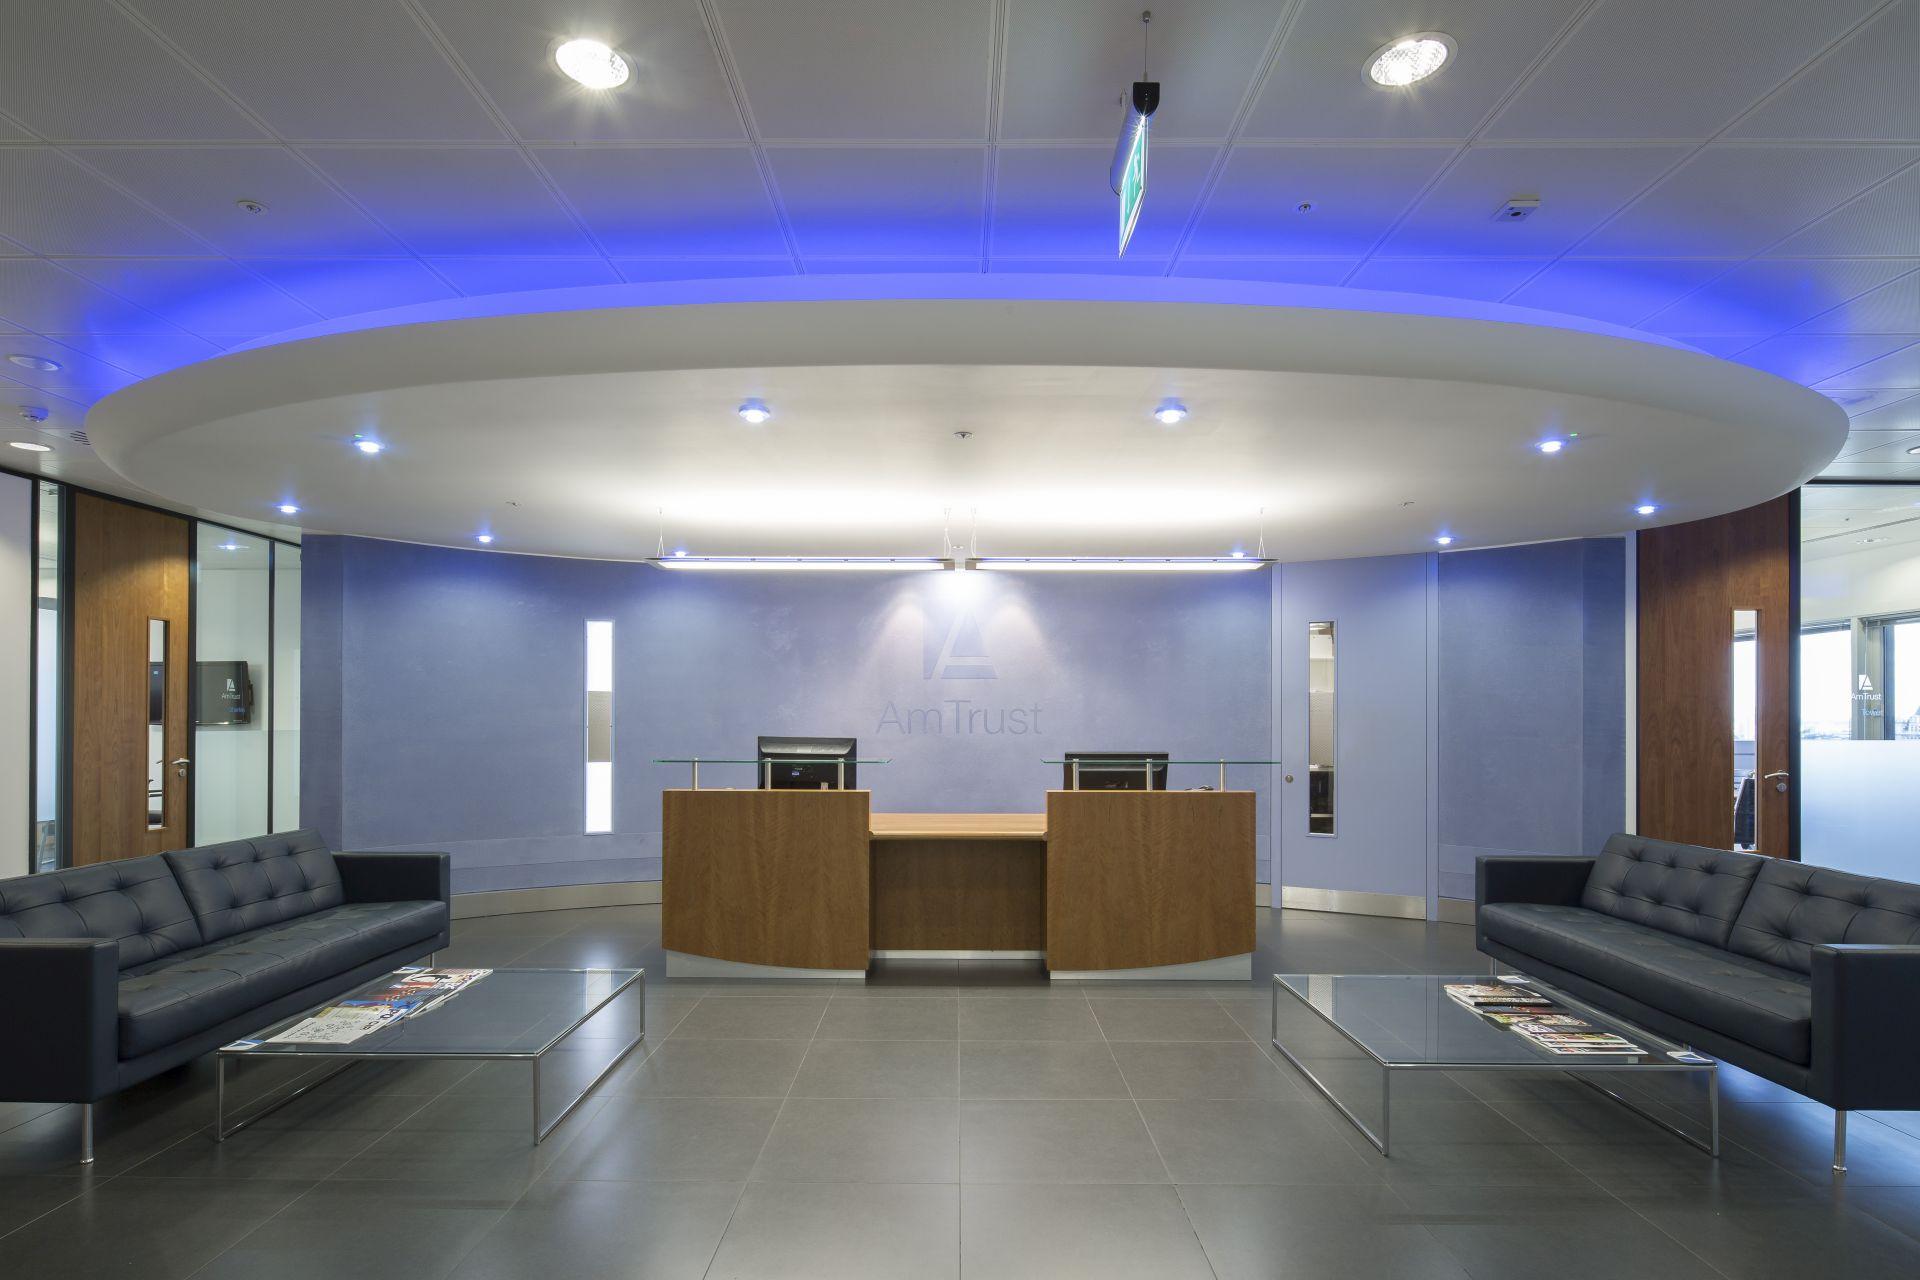 AmTrust Financial reception Case Study Image